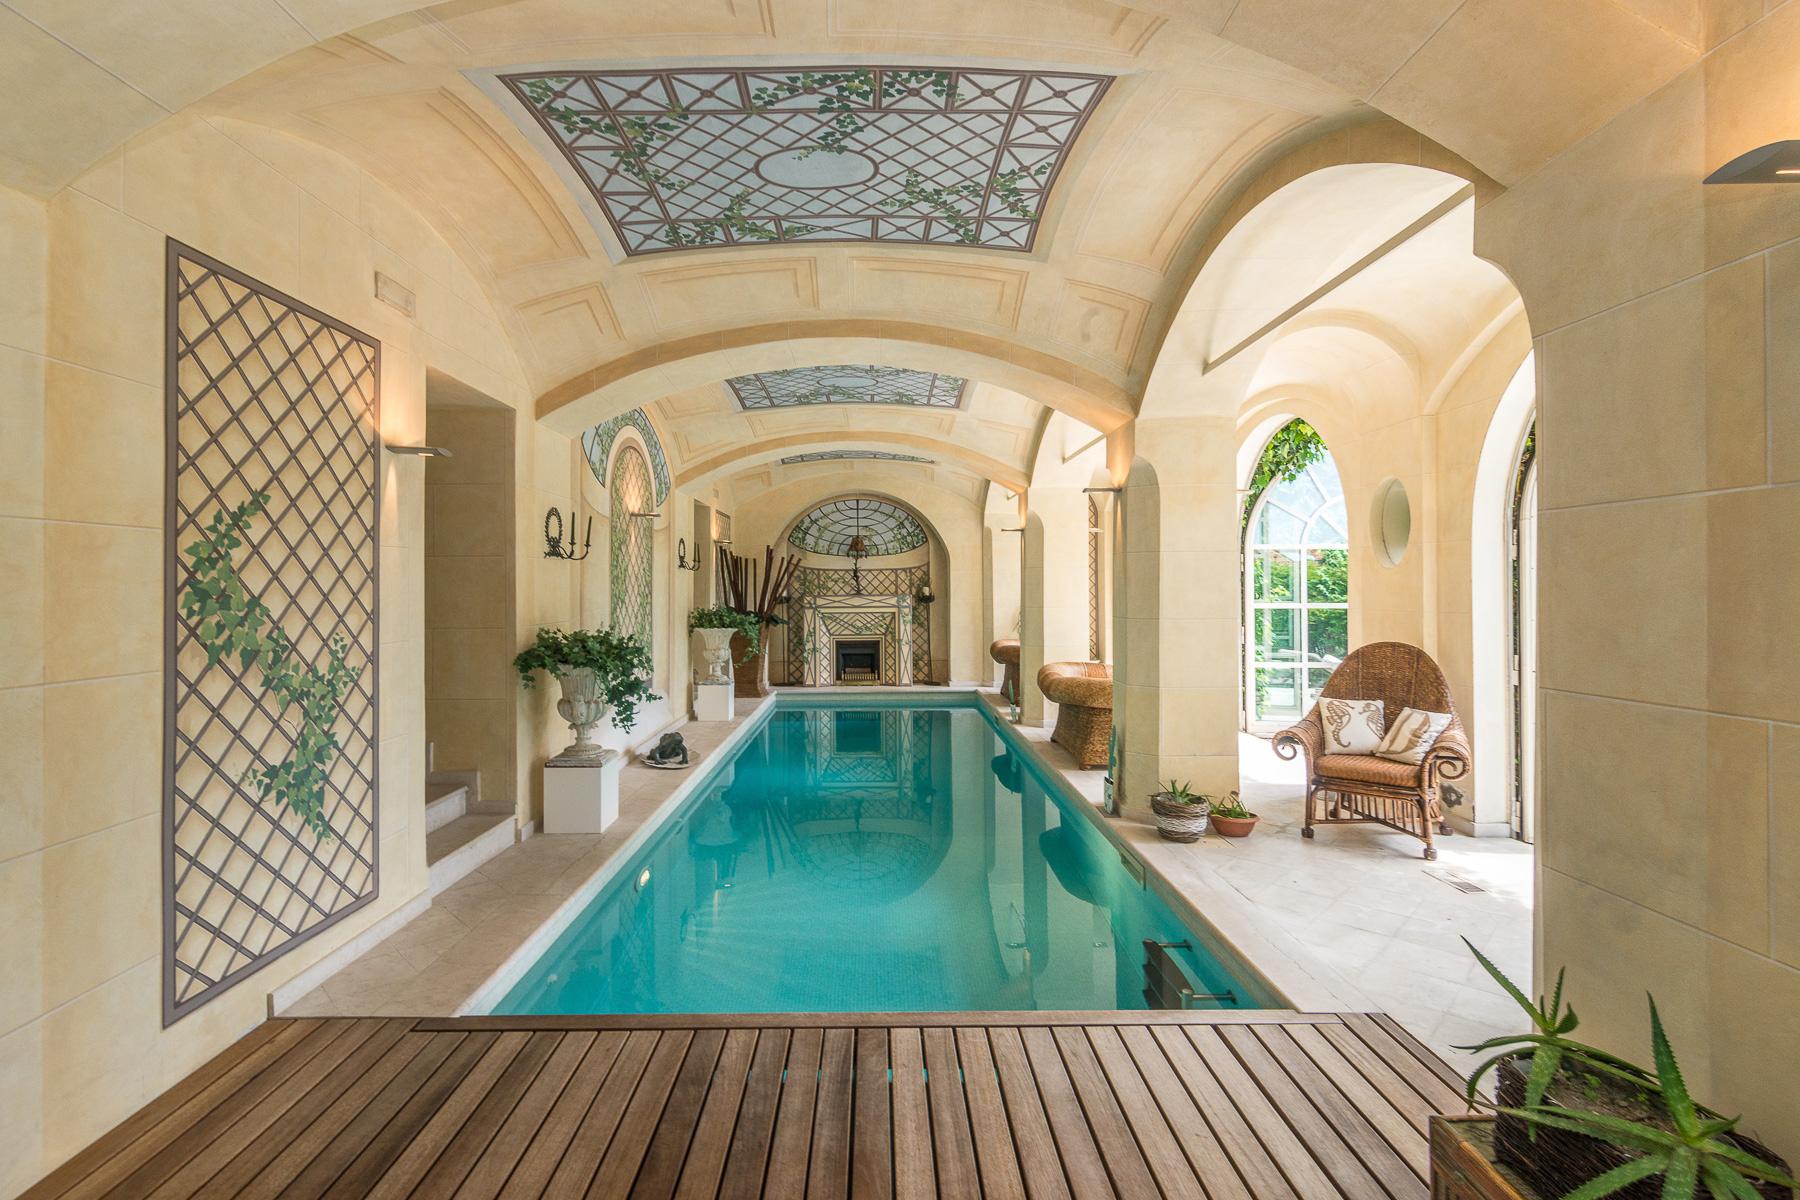 Villa in Vendita a Varese: 5 locali, 1150 mq - Foto 21